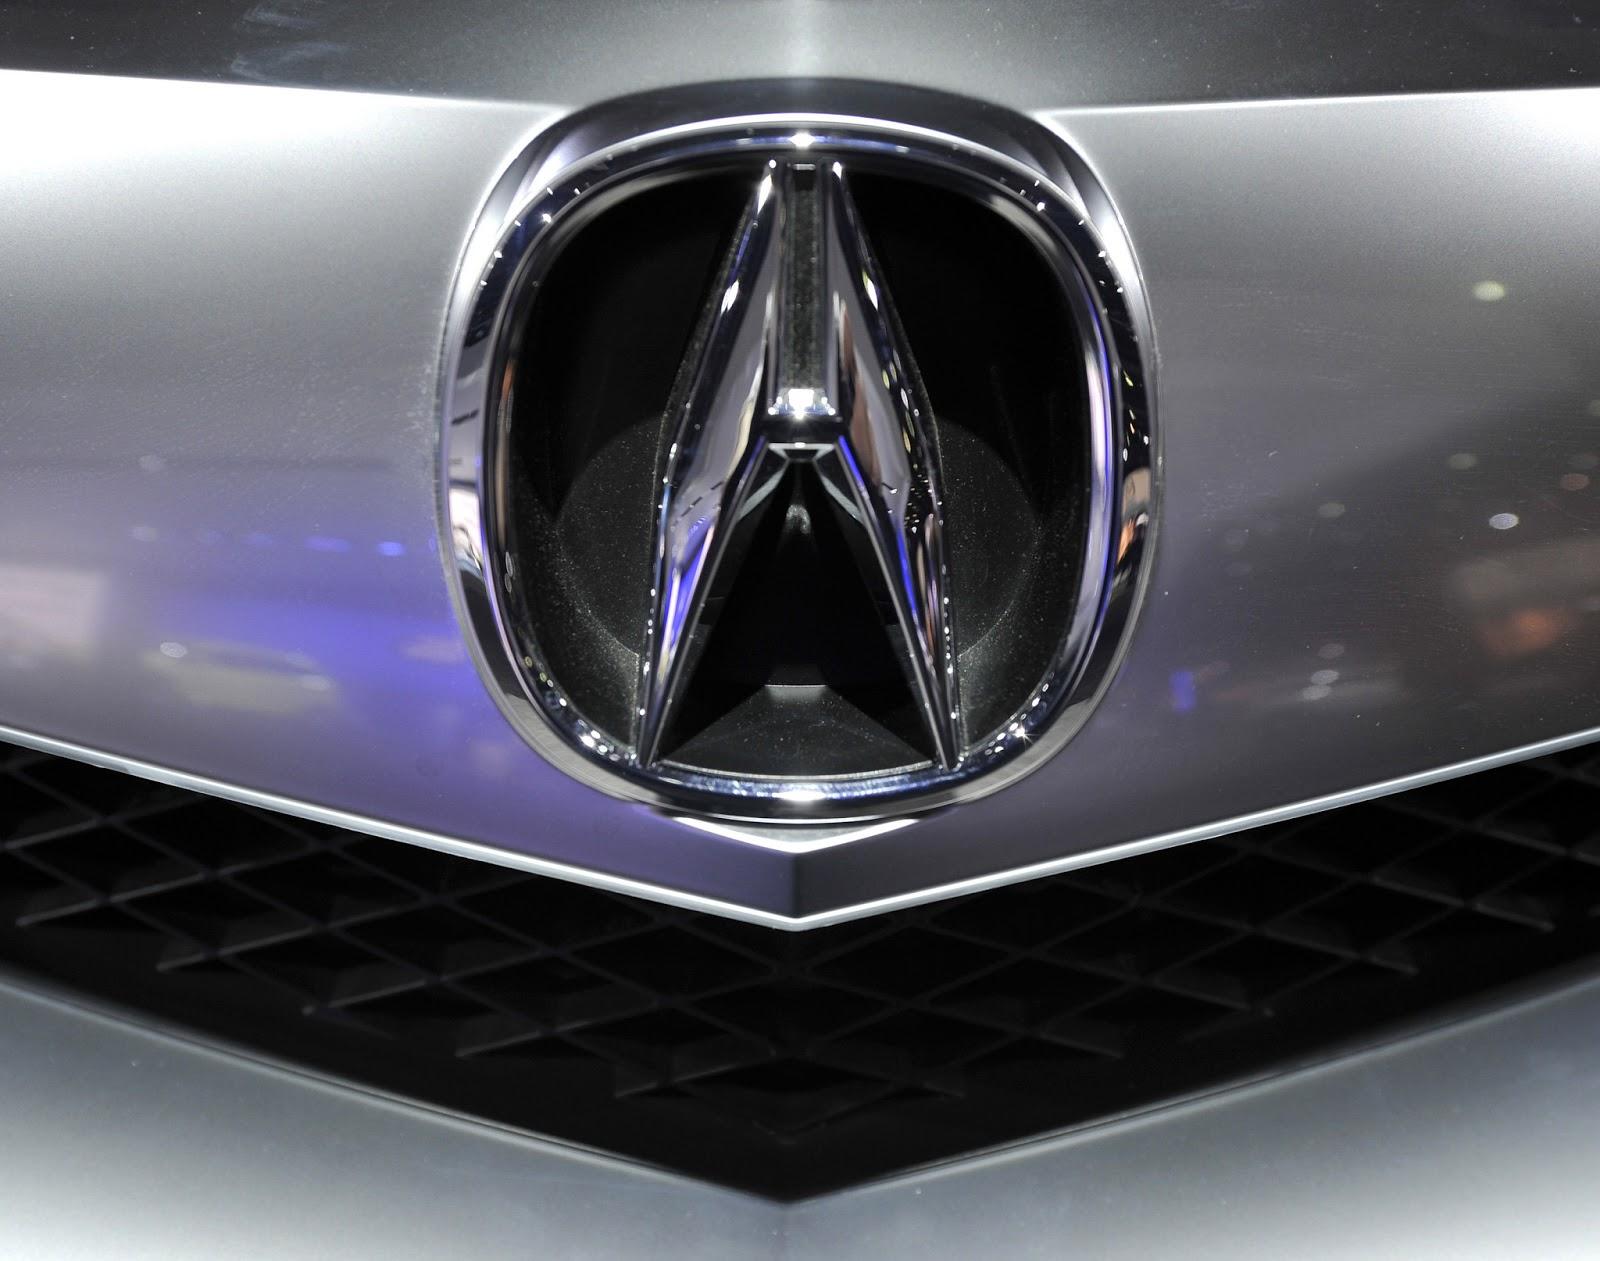 Acura Logo, Acura Car Symbol Meaning and History | Car Brand Names.com